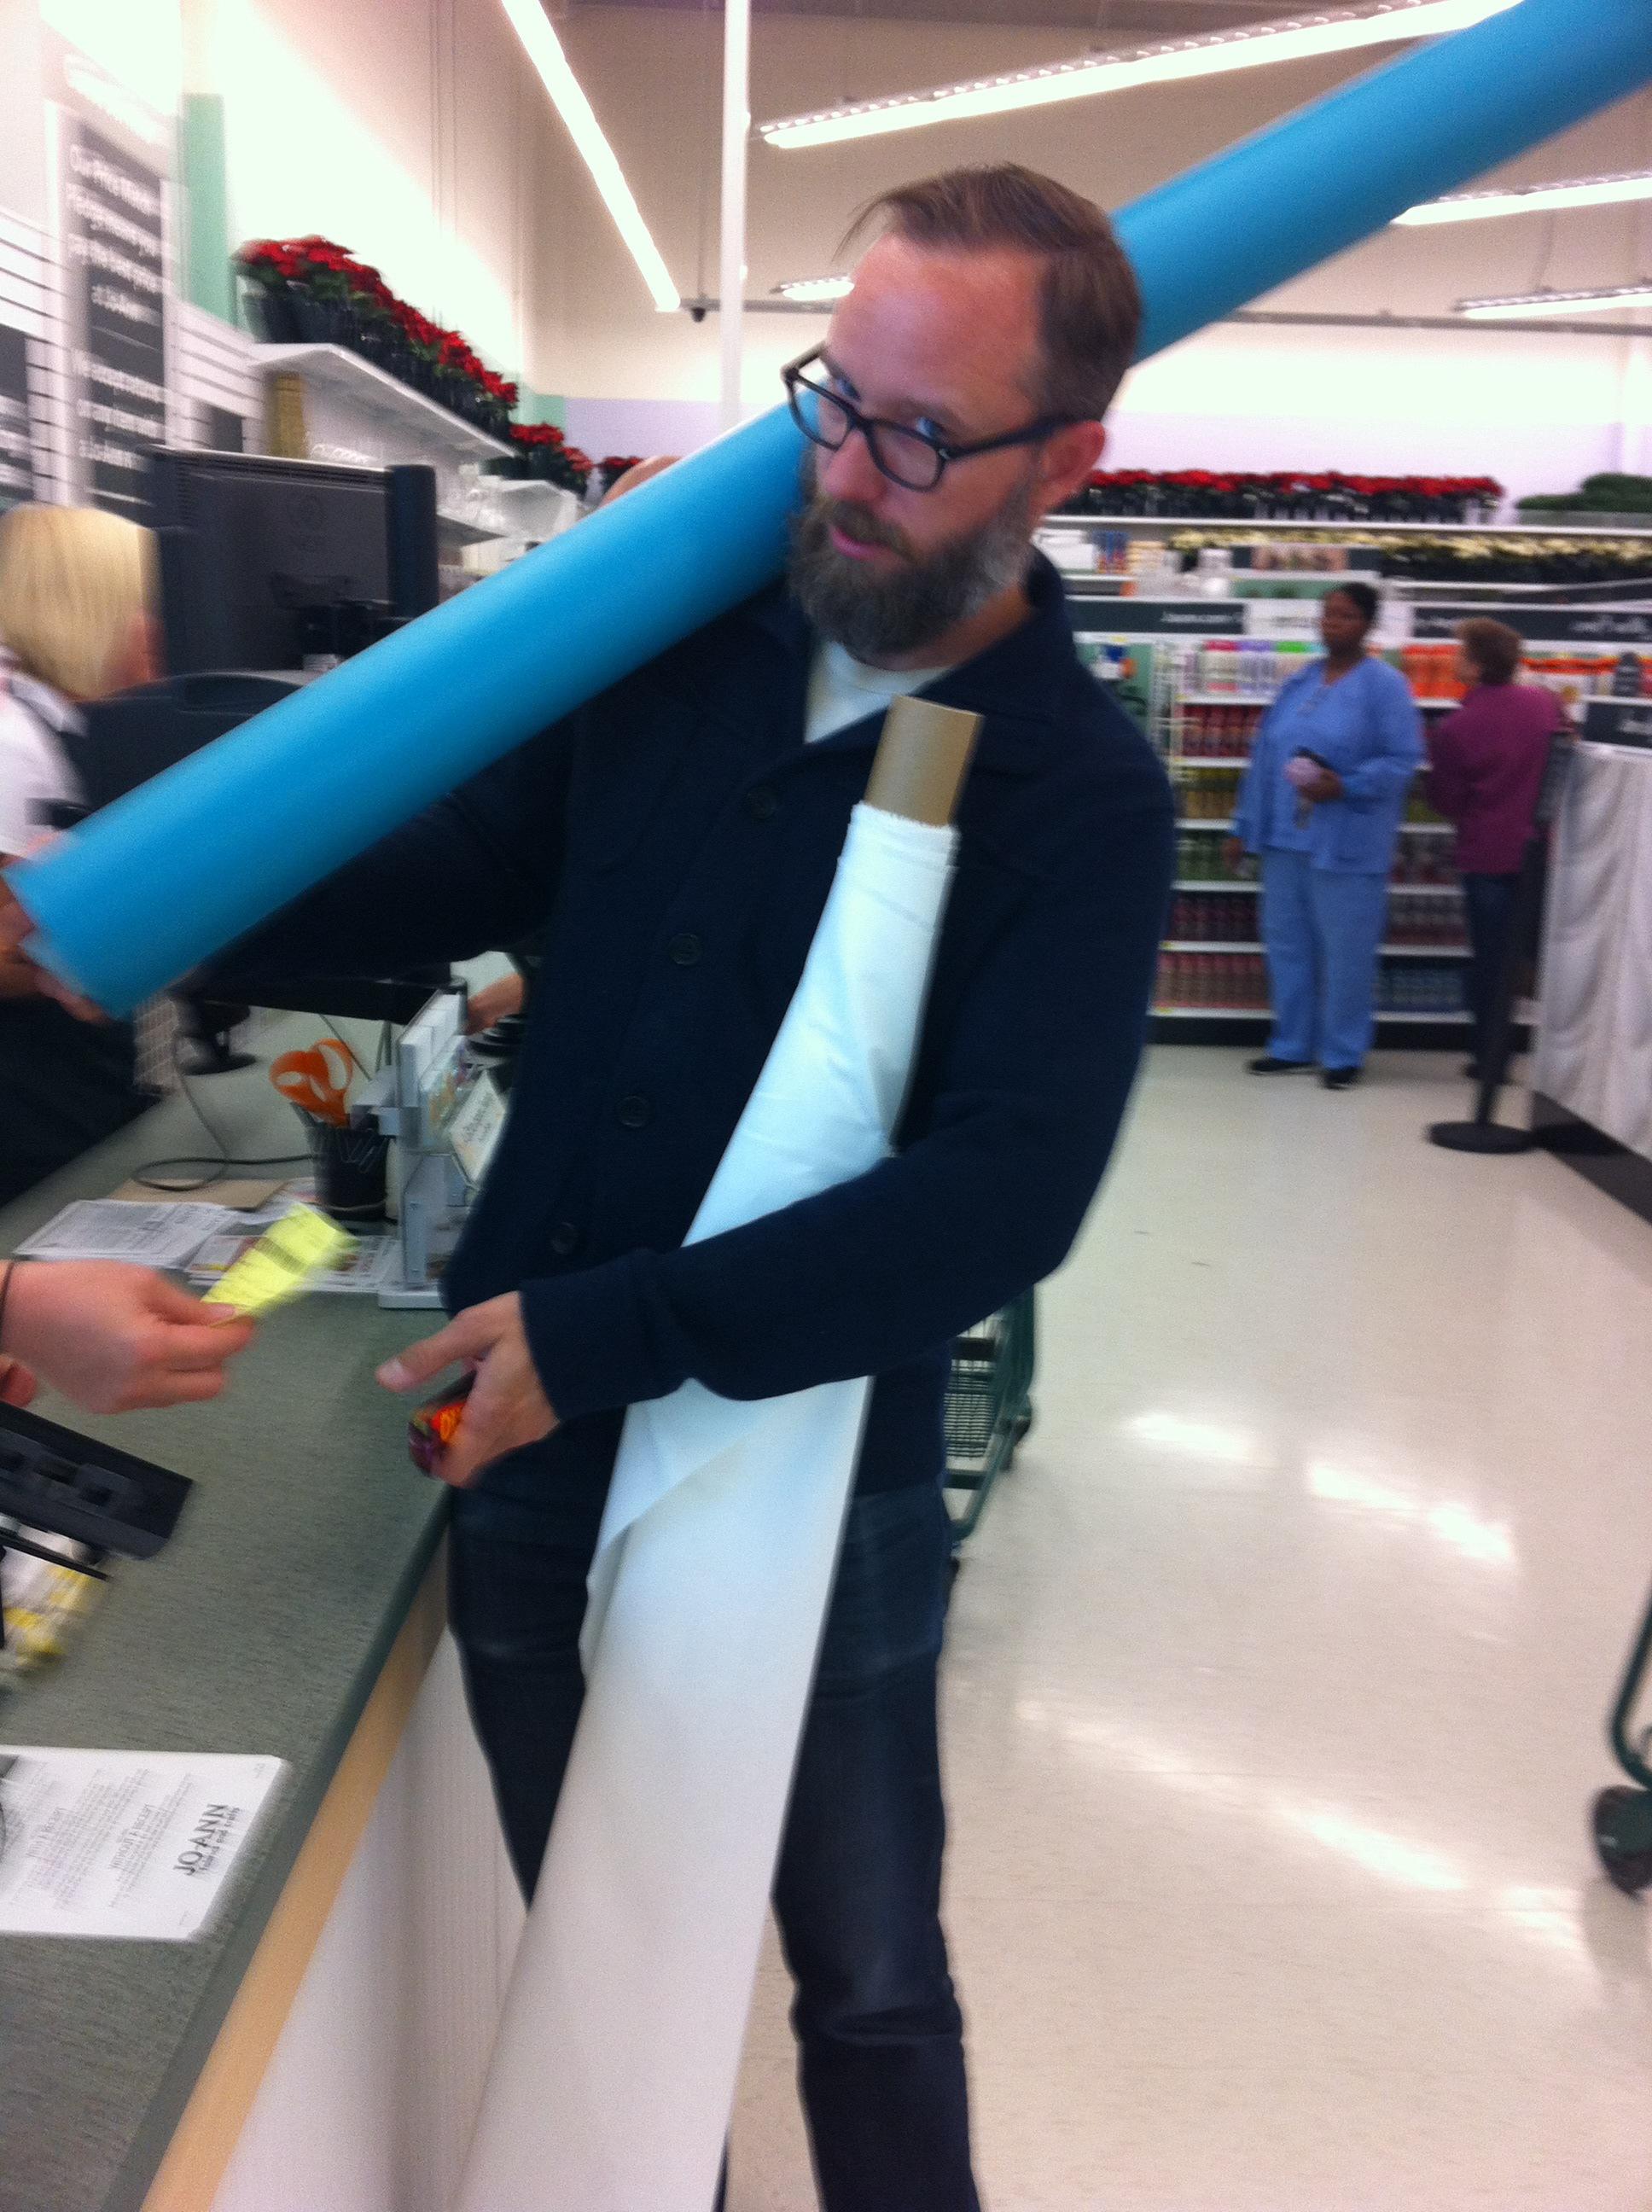 Eric getting new fabrics at JoAnn Fabrics.